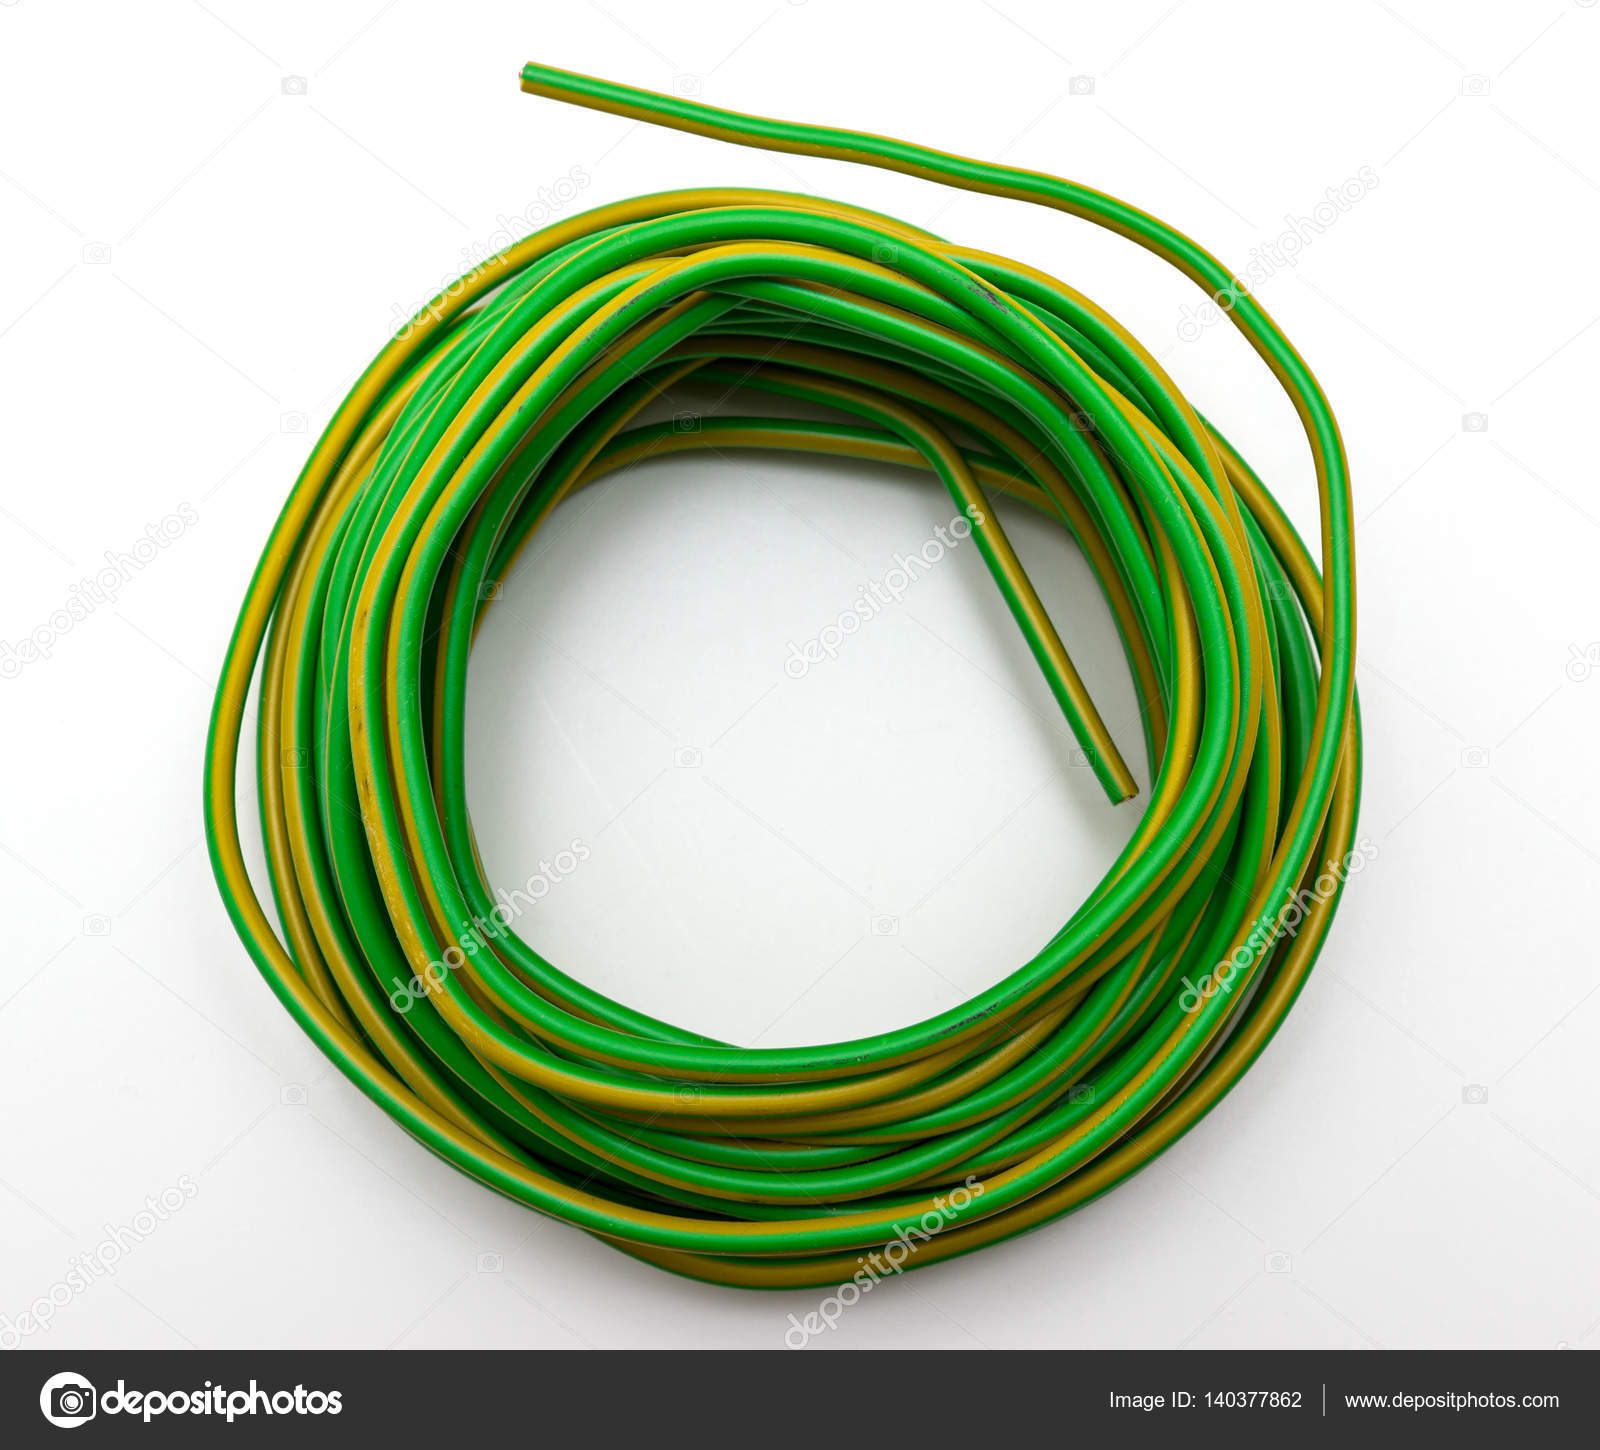 Draht mit grünen Kunststoff überzogen — Stockfoto © simm49 #140377862